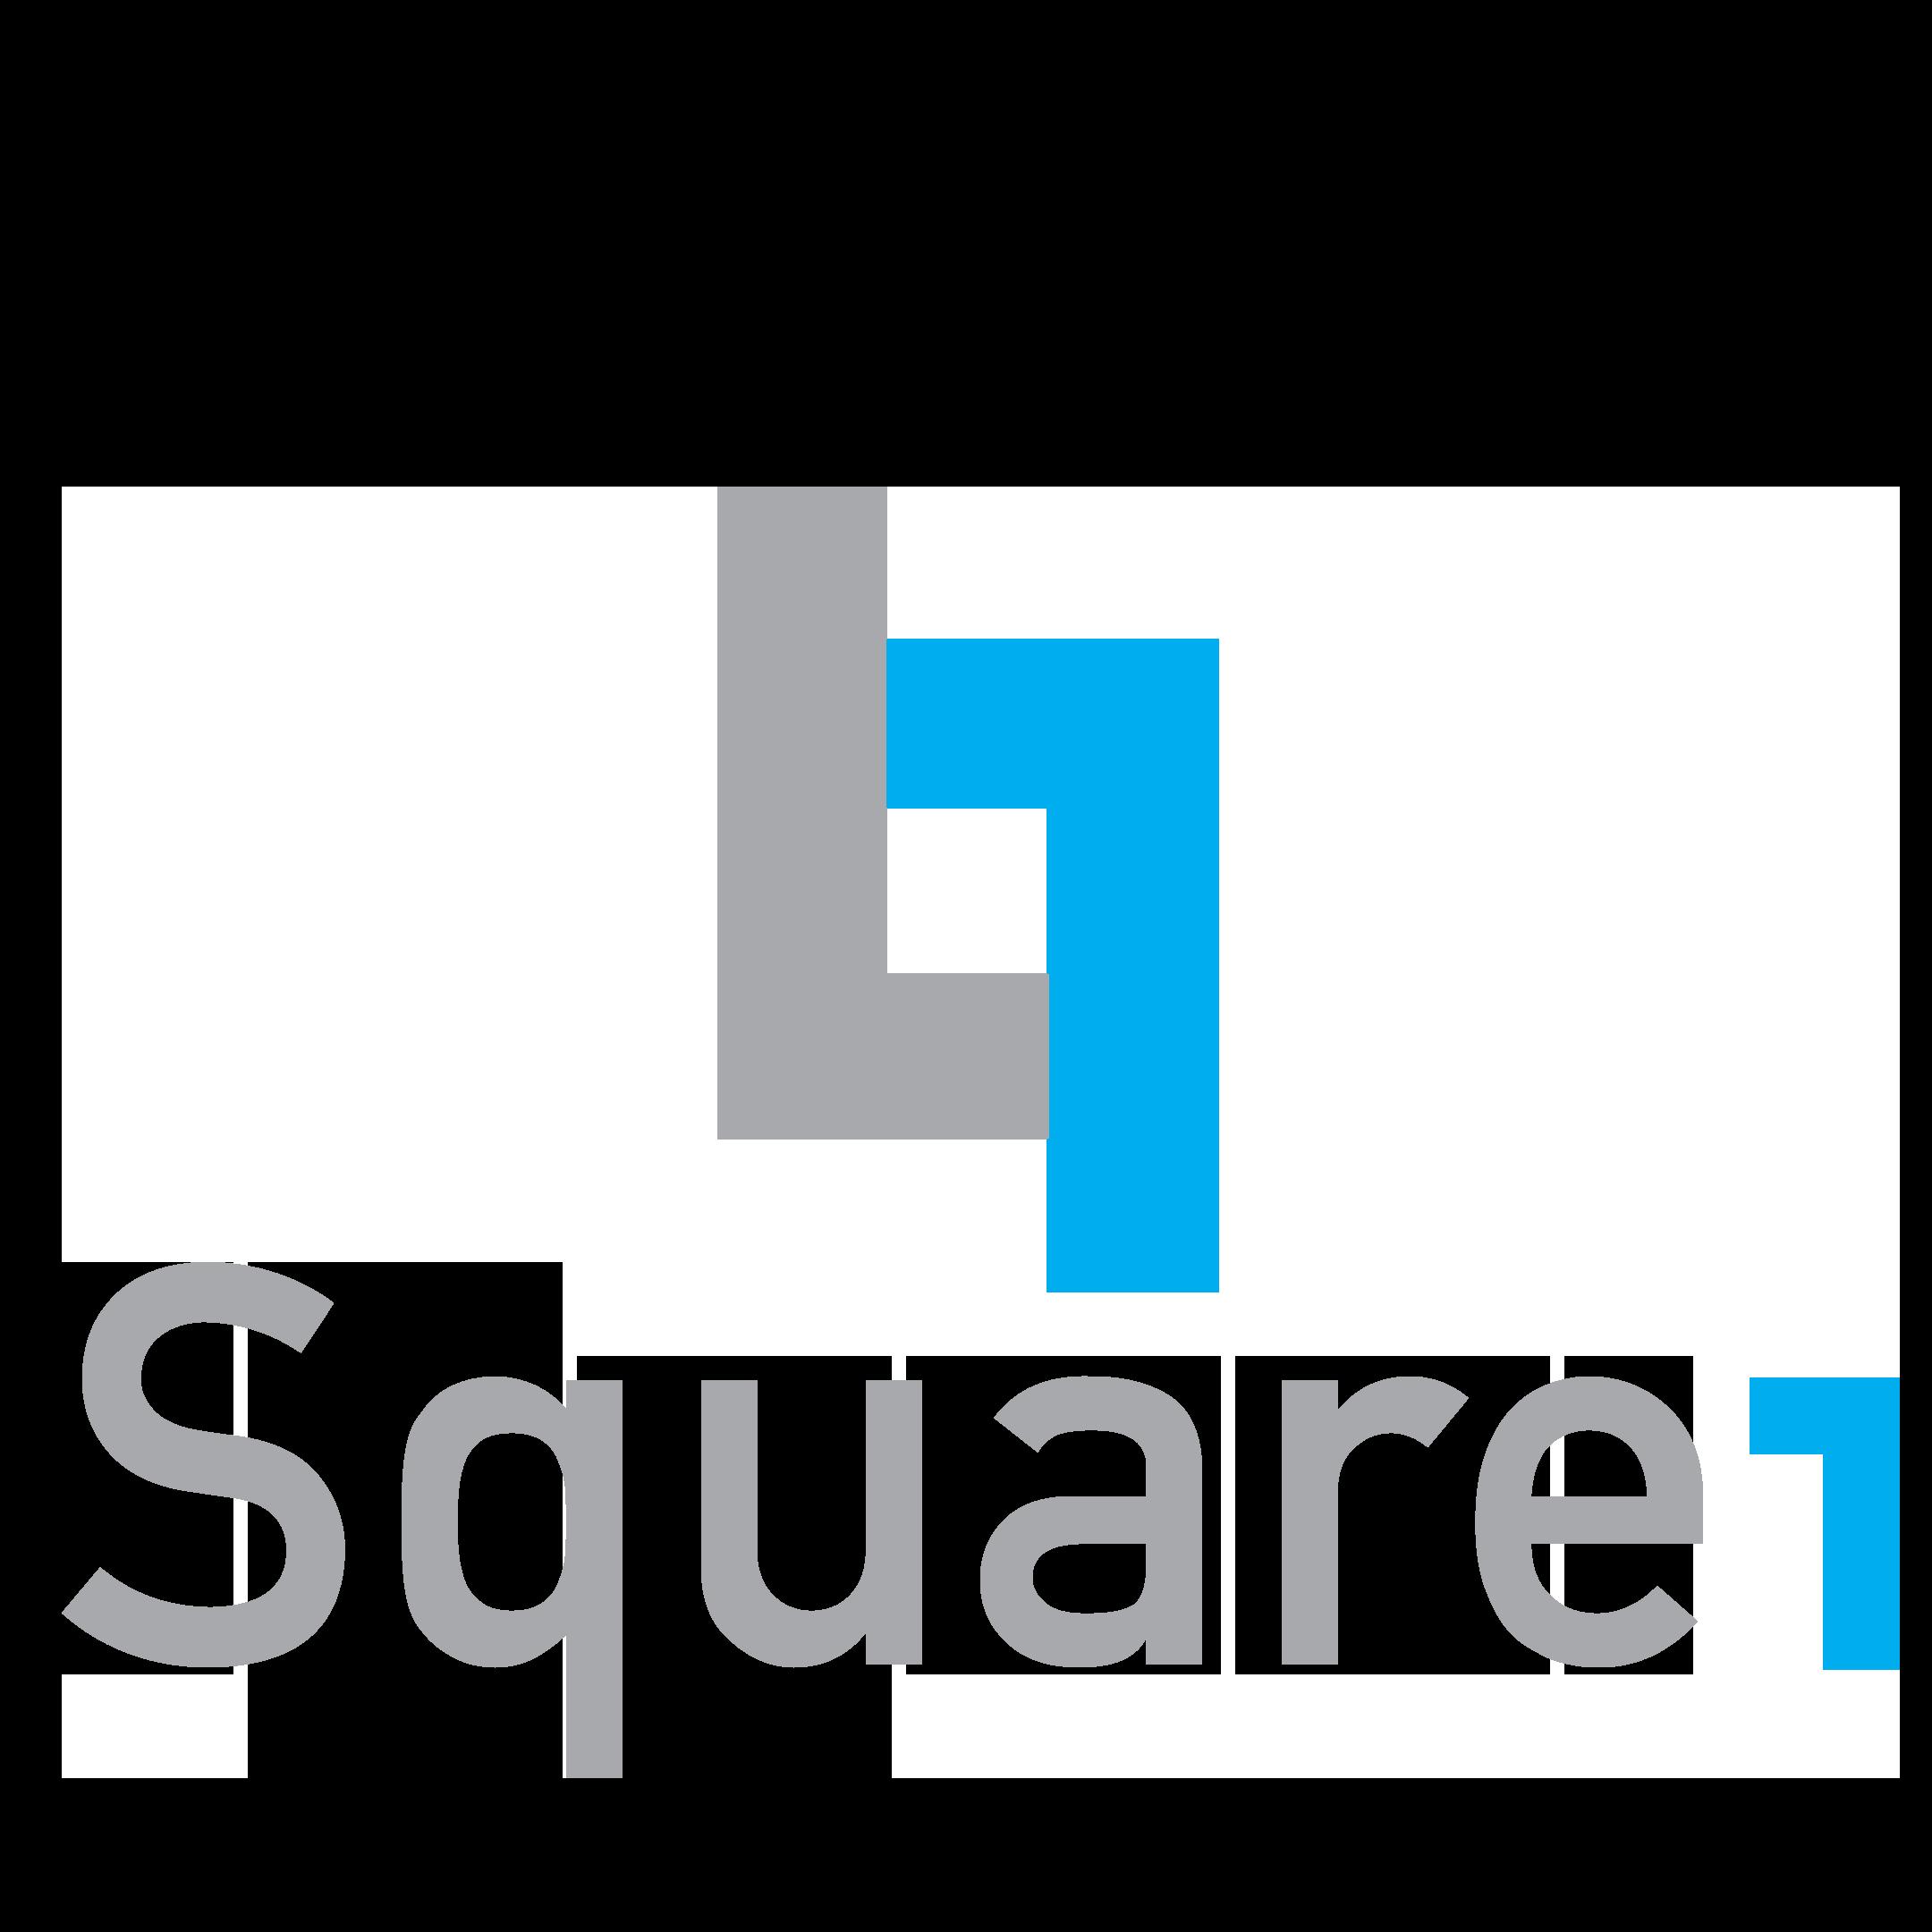 square1 logo sqaured